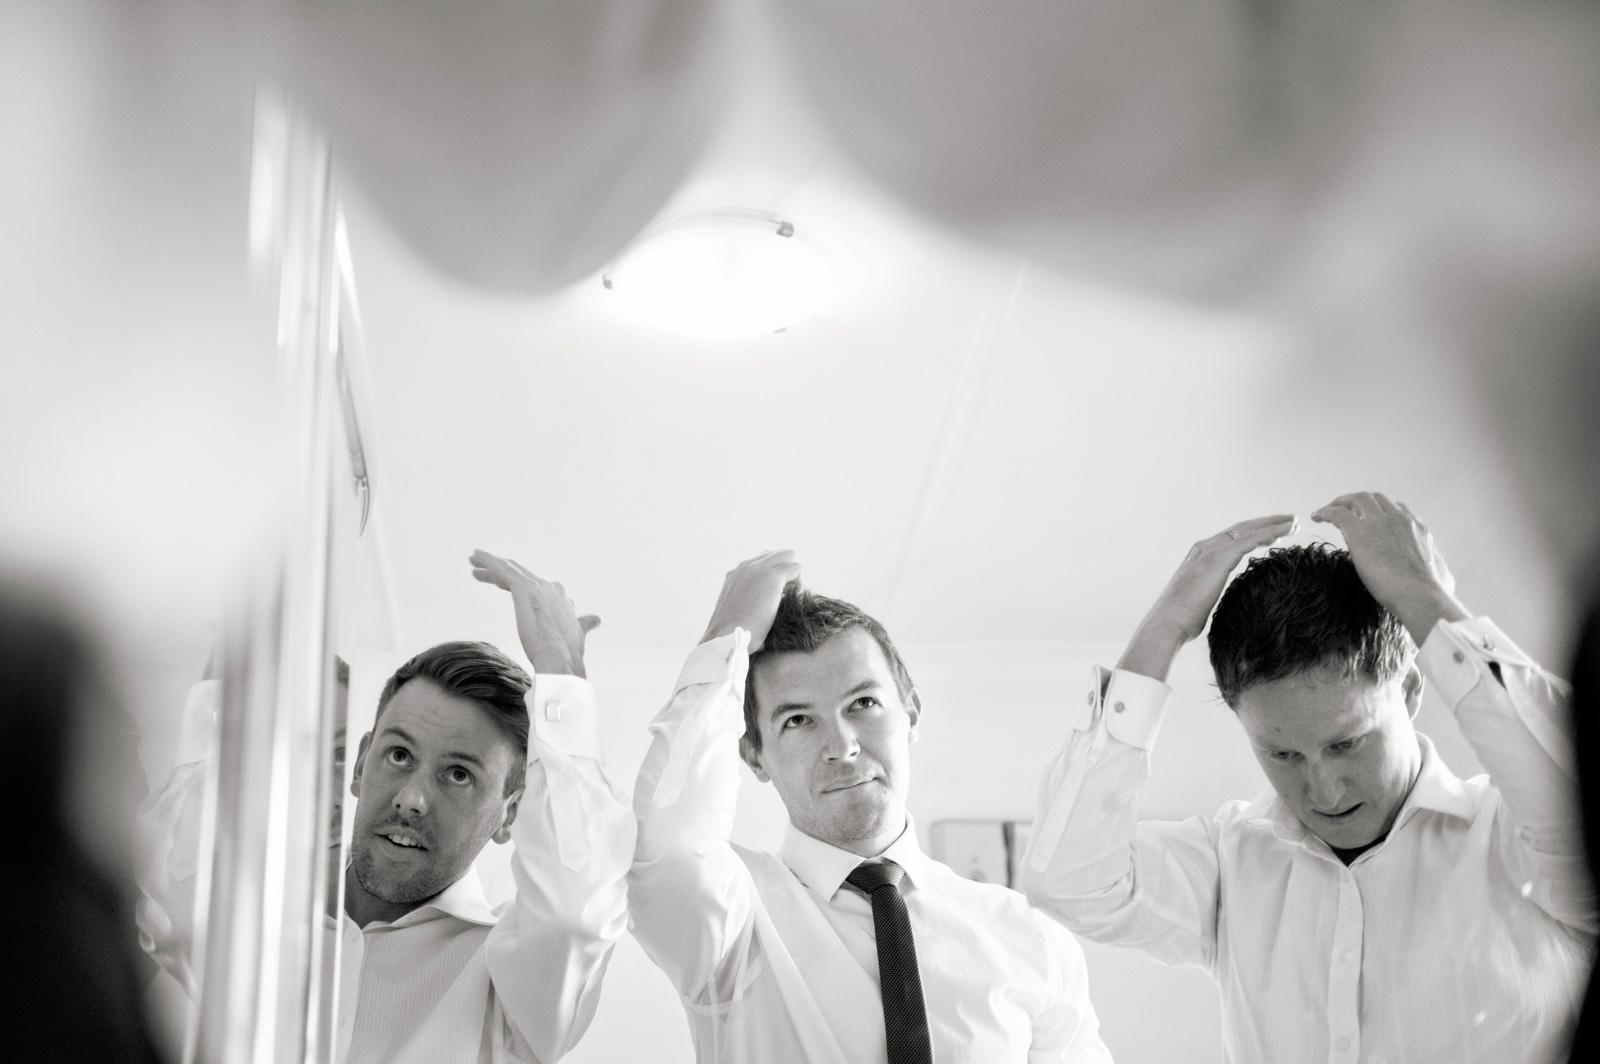 Men styling hair